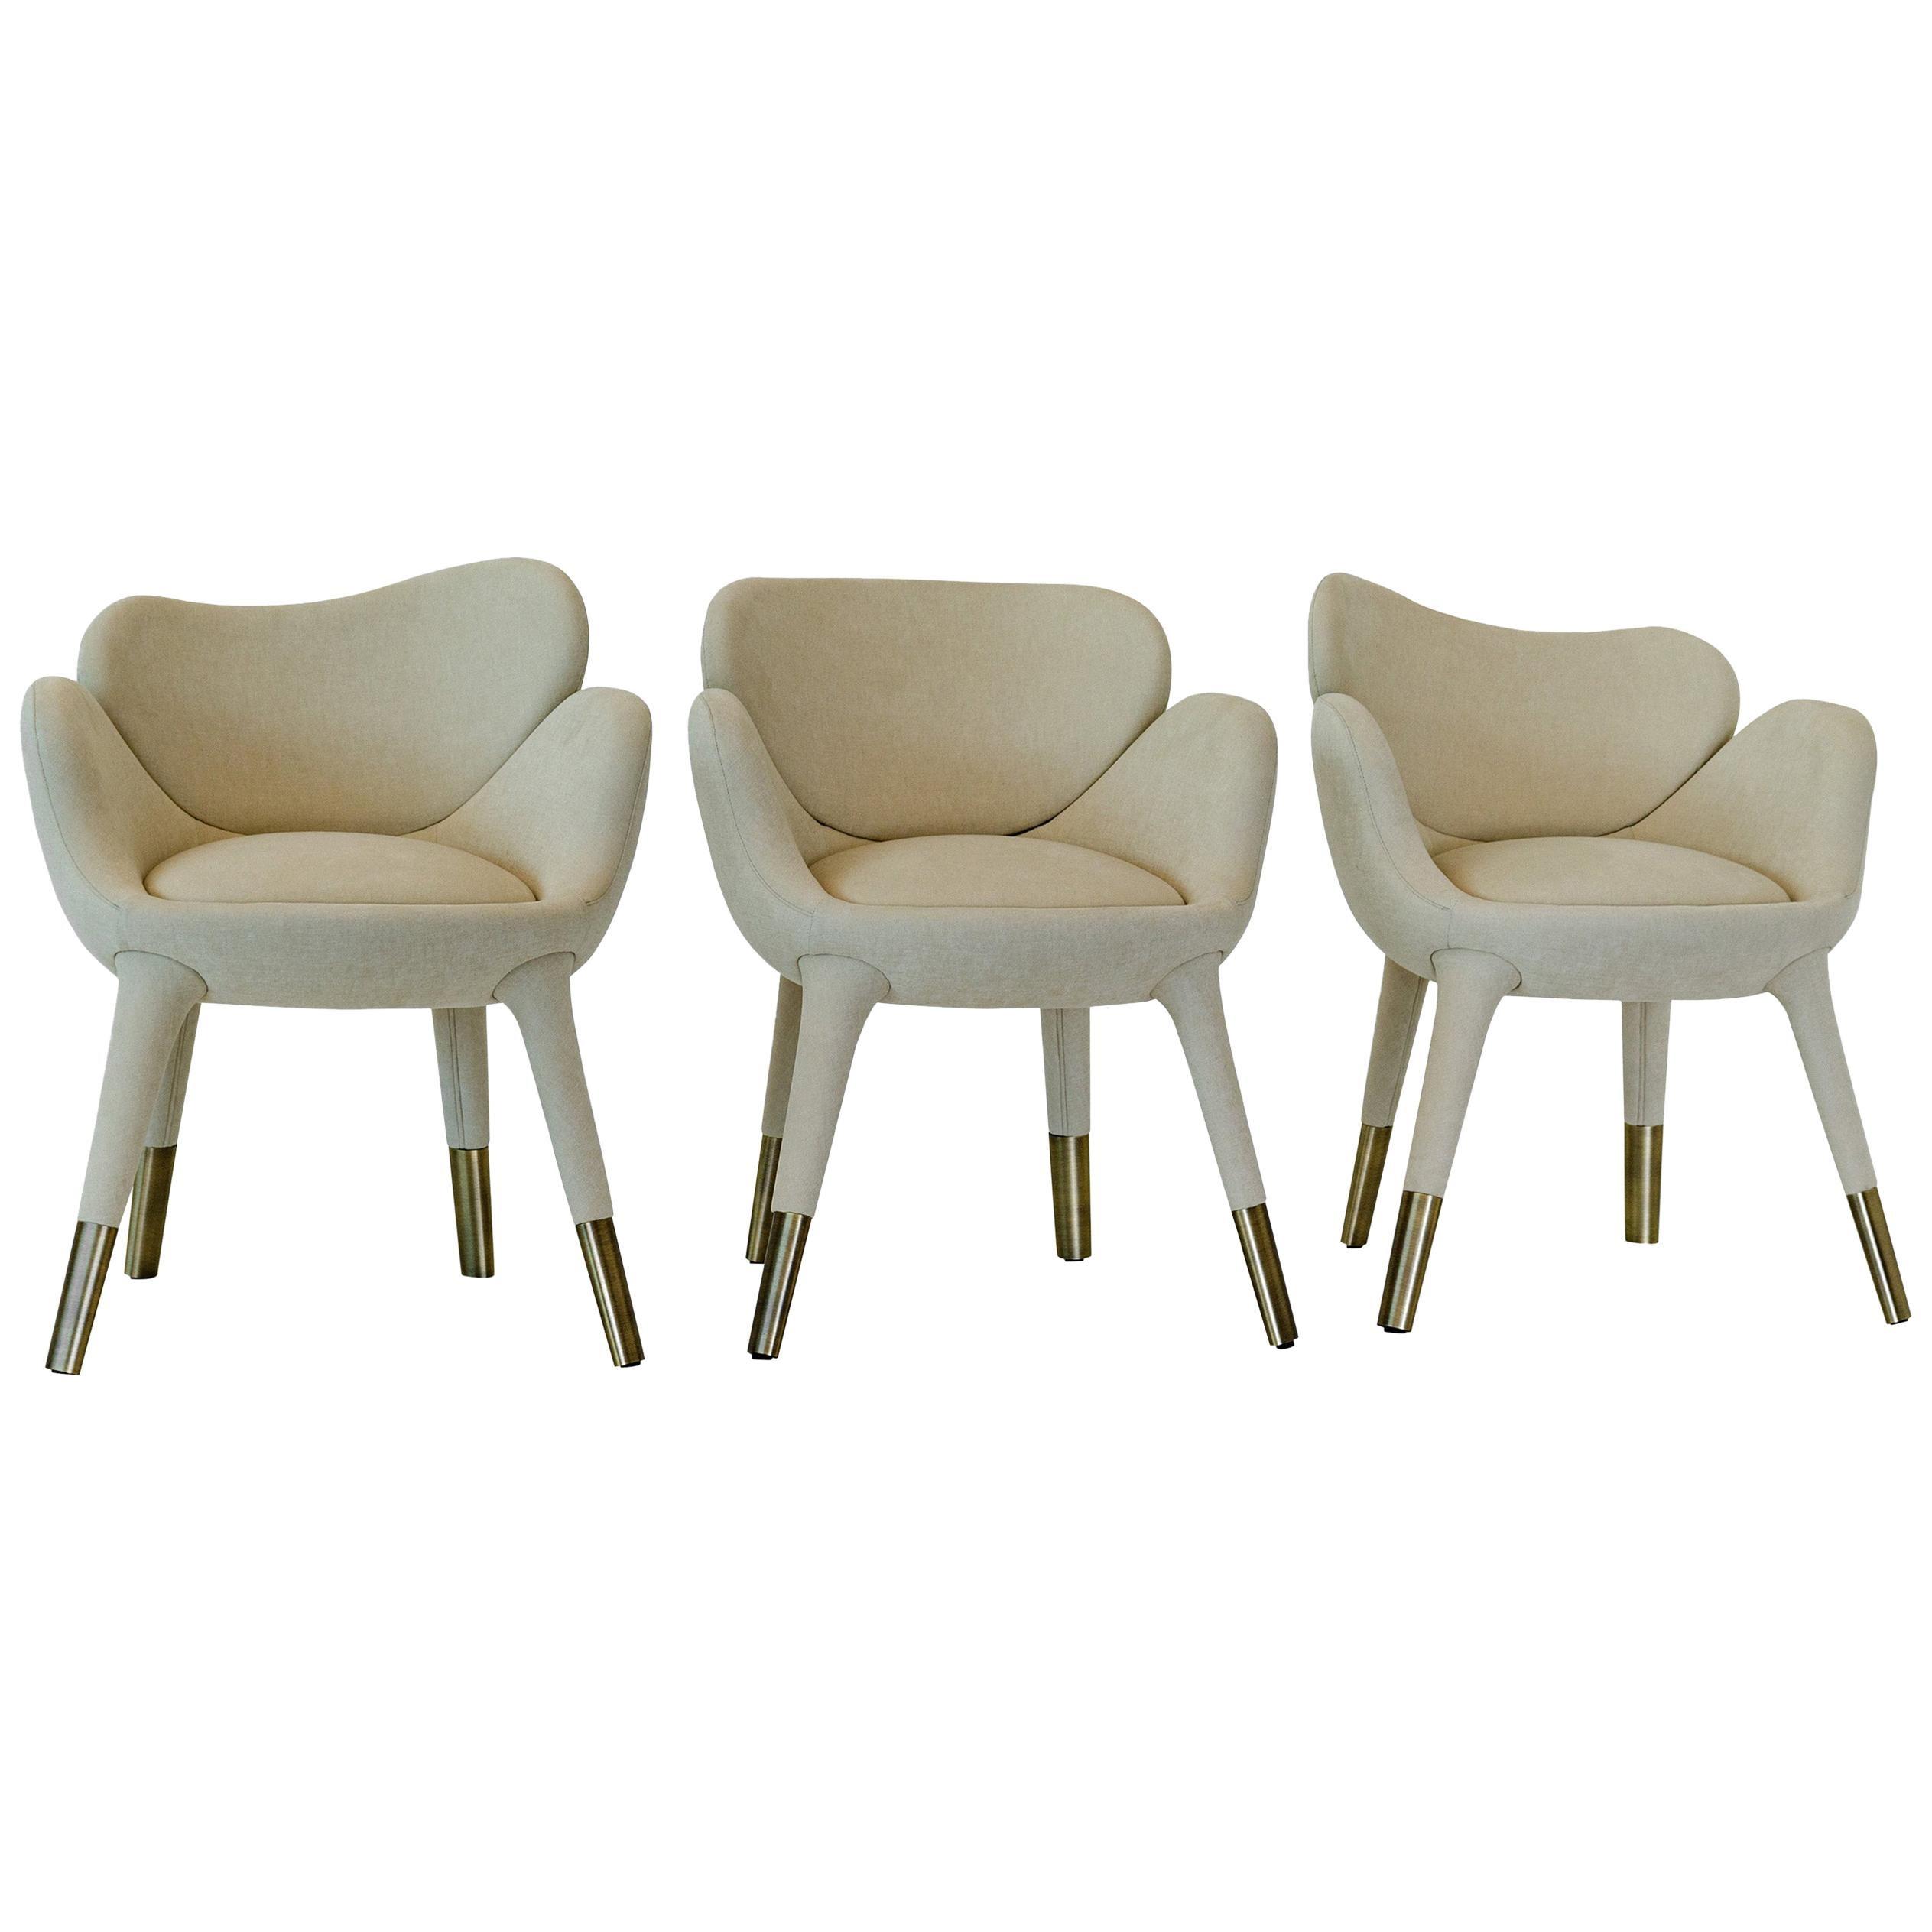 Achille Salvagni Chairs